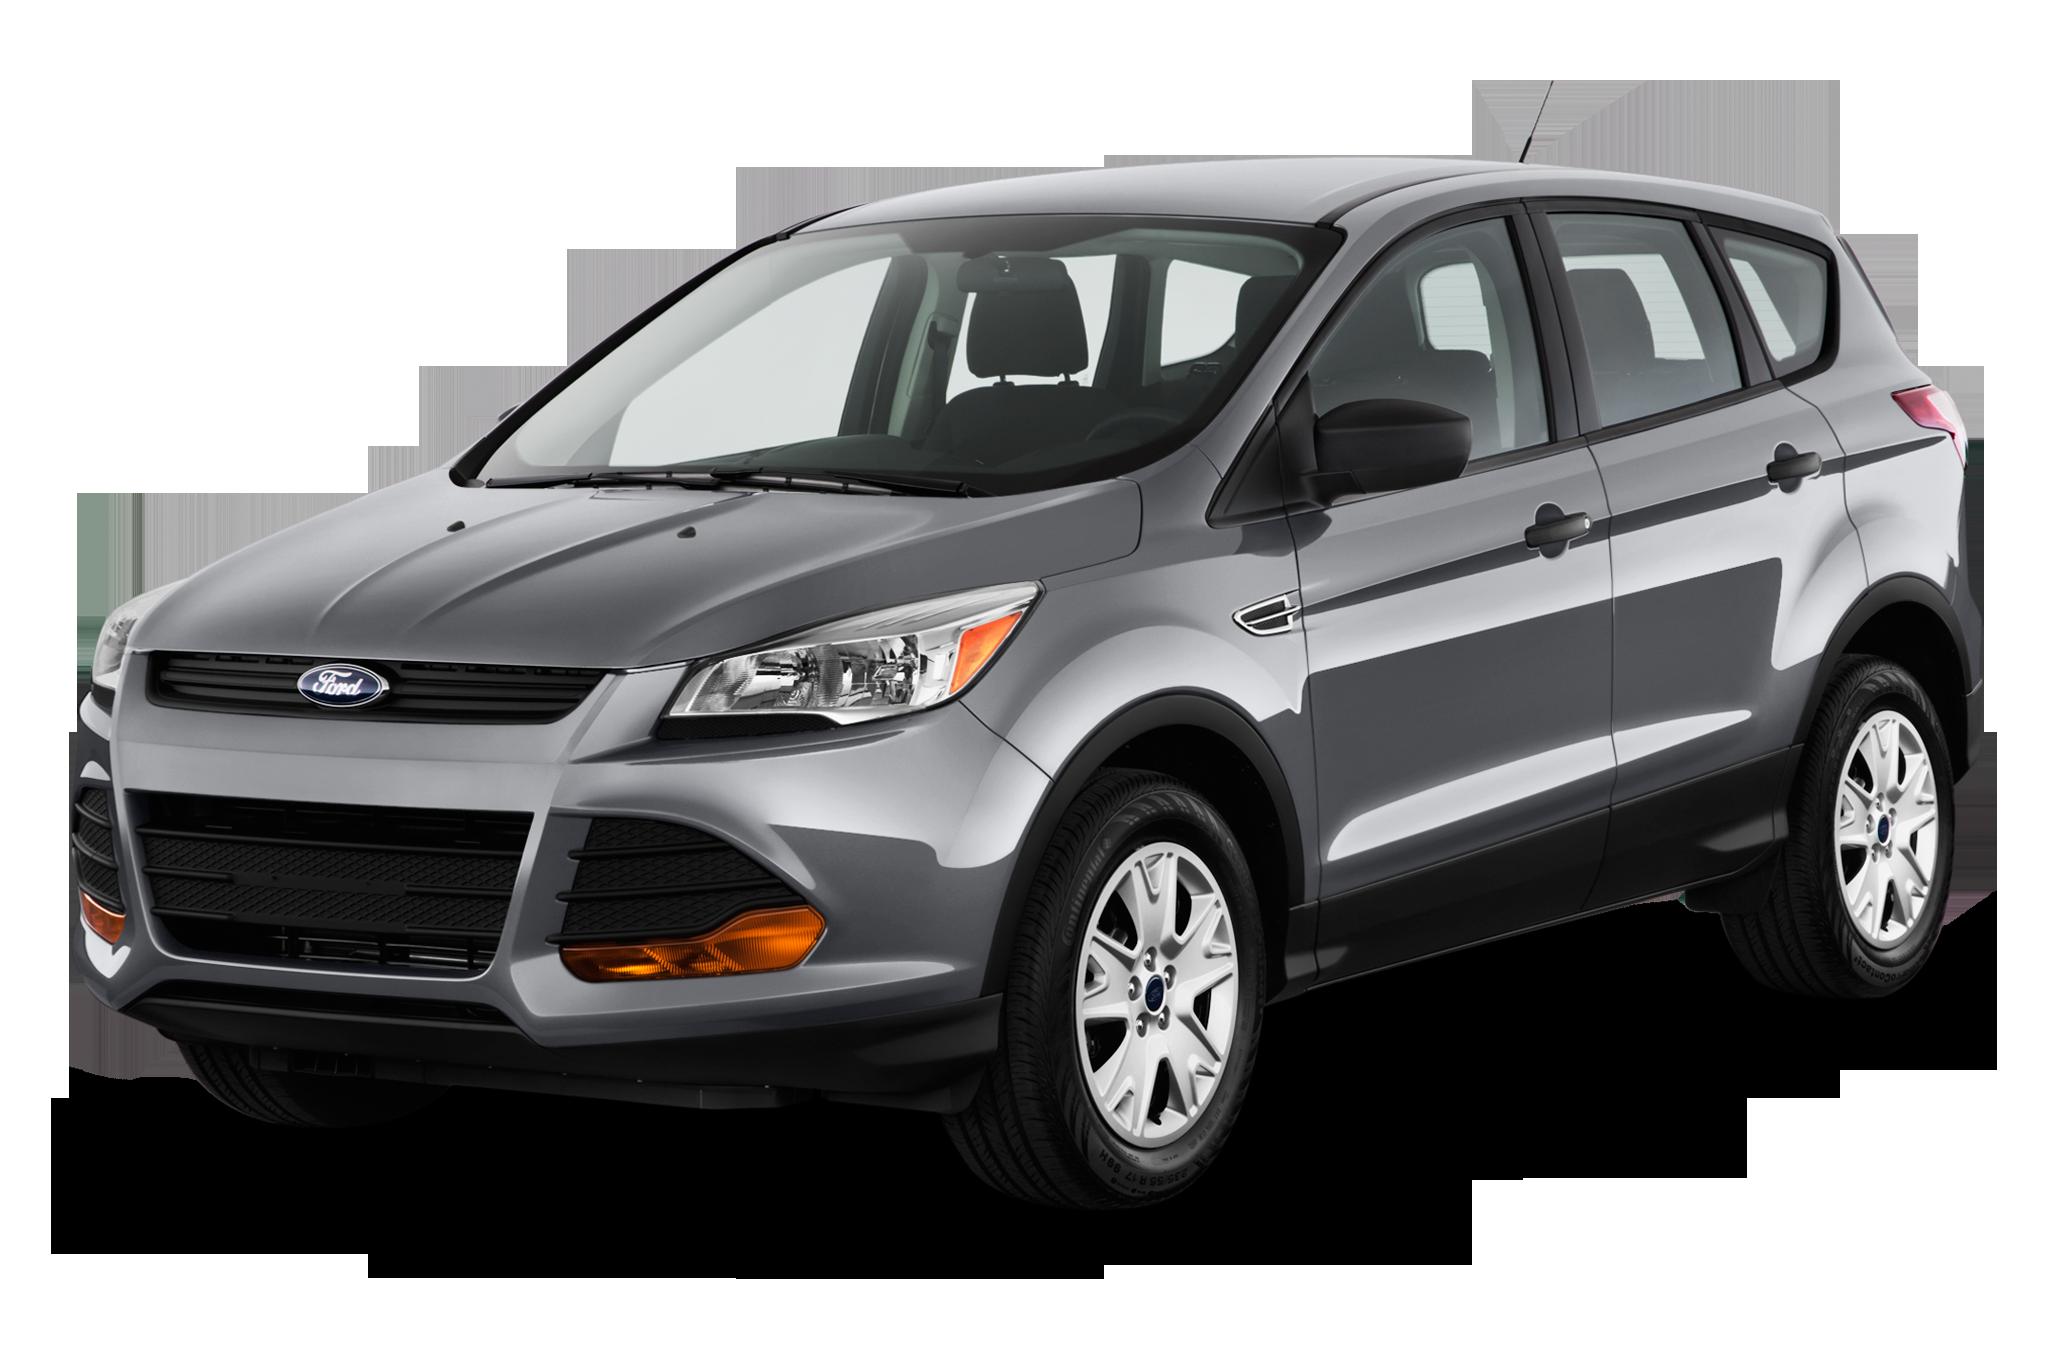 2017 Ford Escape Reviews.